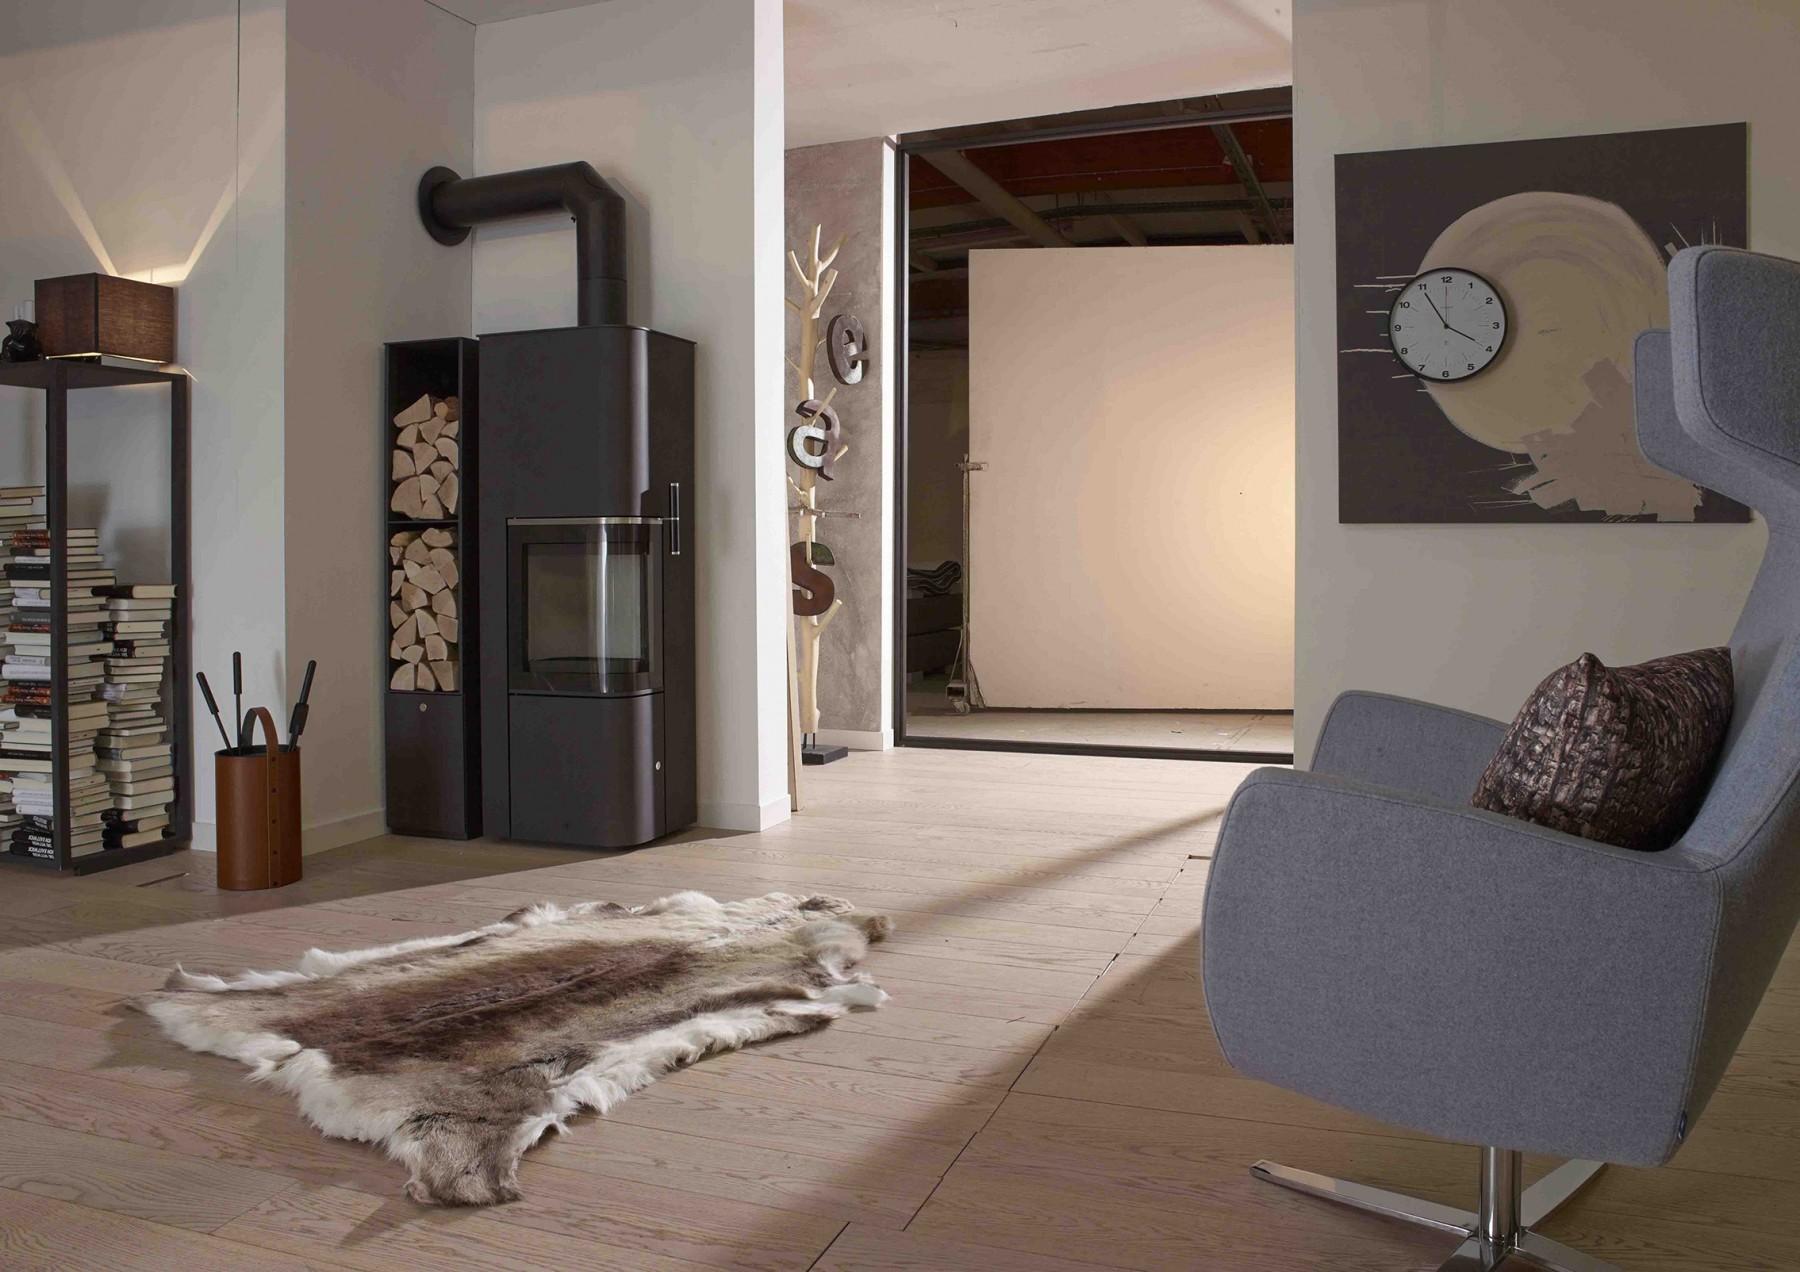 cera babylos kaminofen mit holzfach feuerland kiel. Black Bedroom Furniture Sets. Home Design Ideas